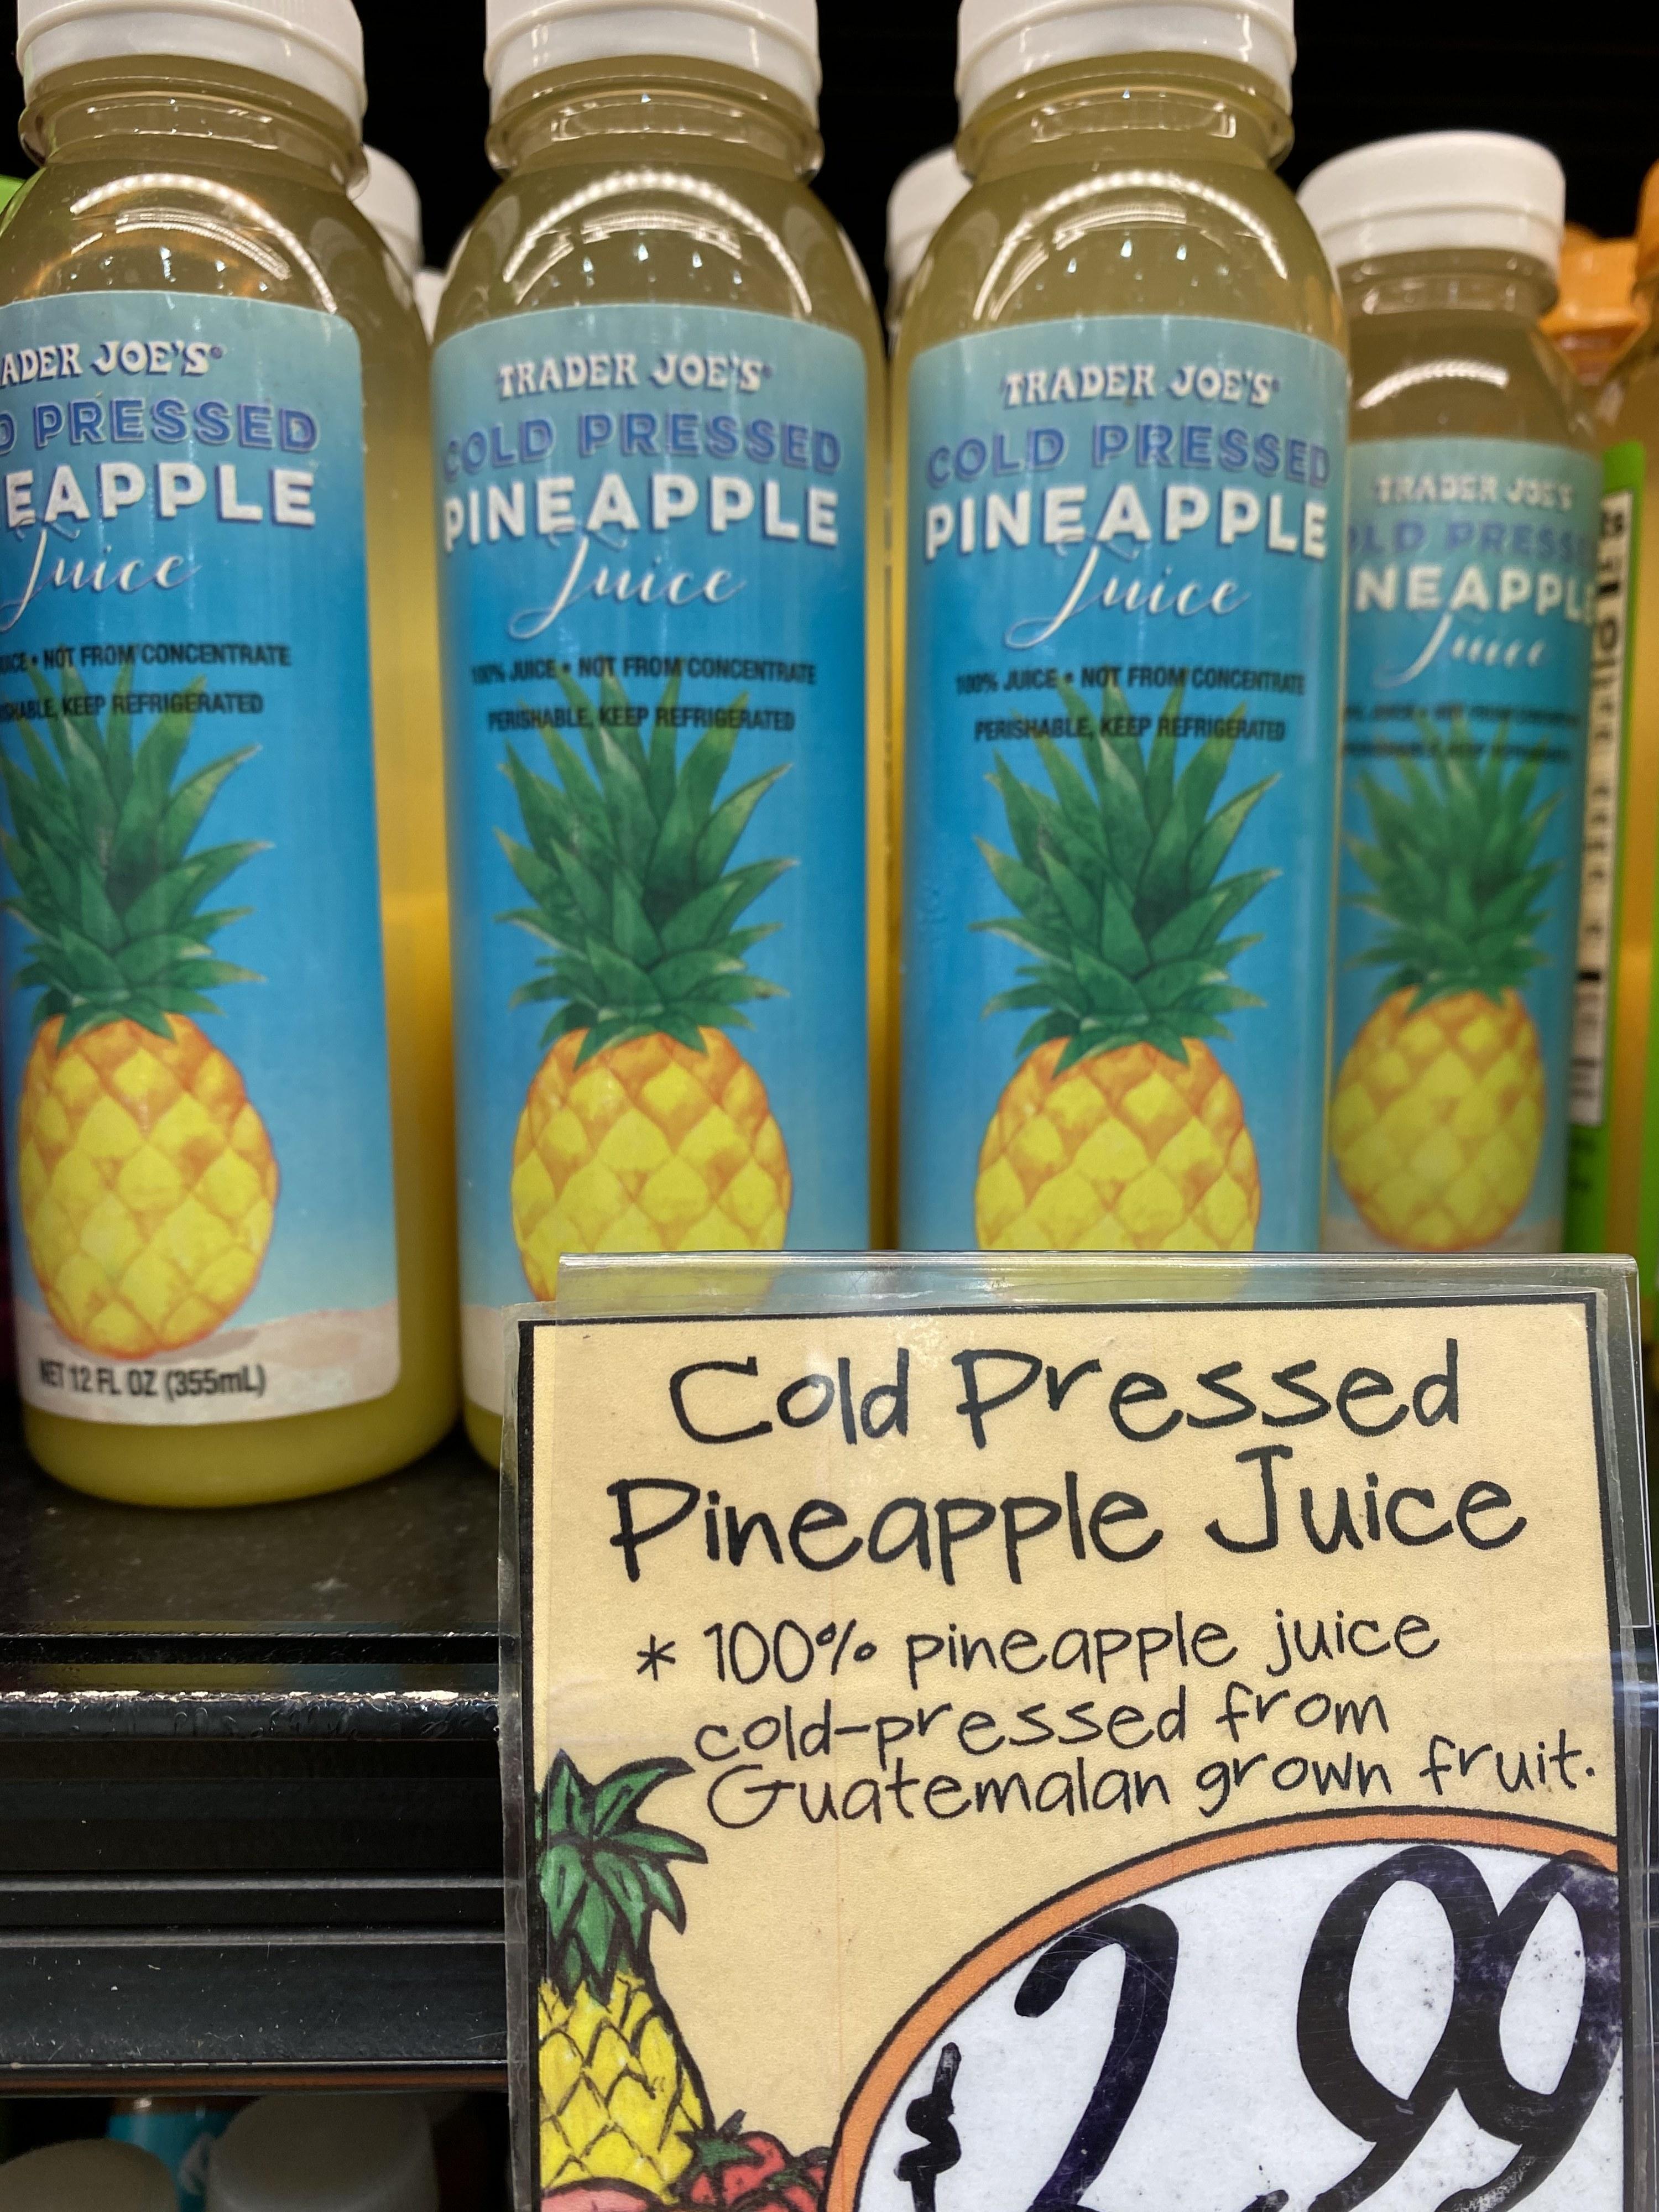 Bottles of Trader Joe's cold pressed pineapple juice.